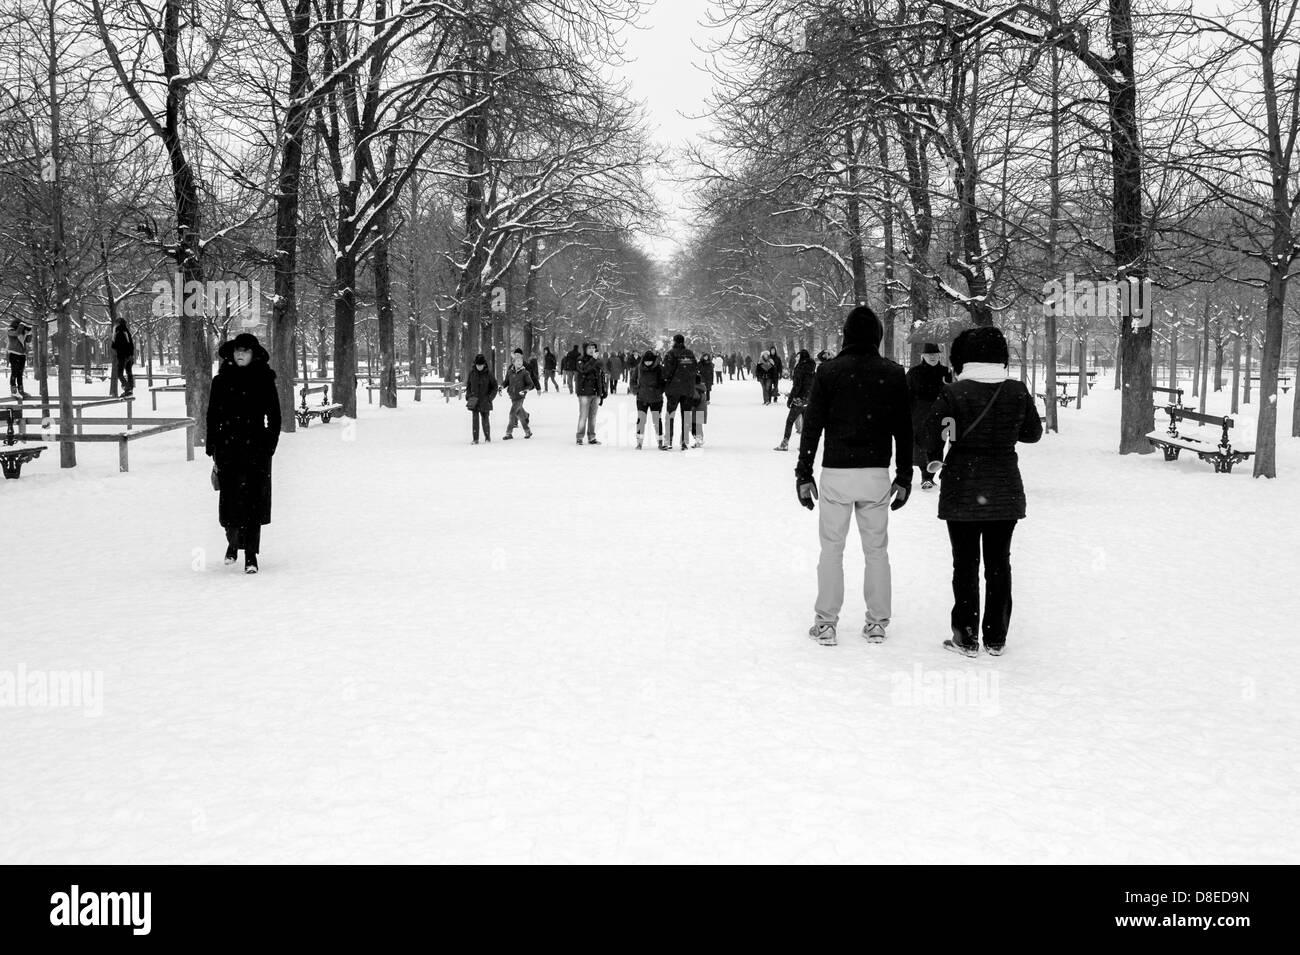 People enjoying snowy park. - Stock Image